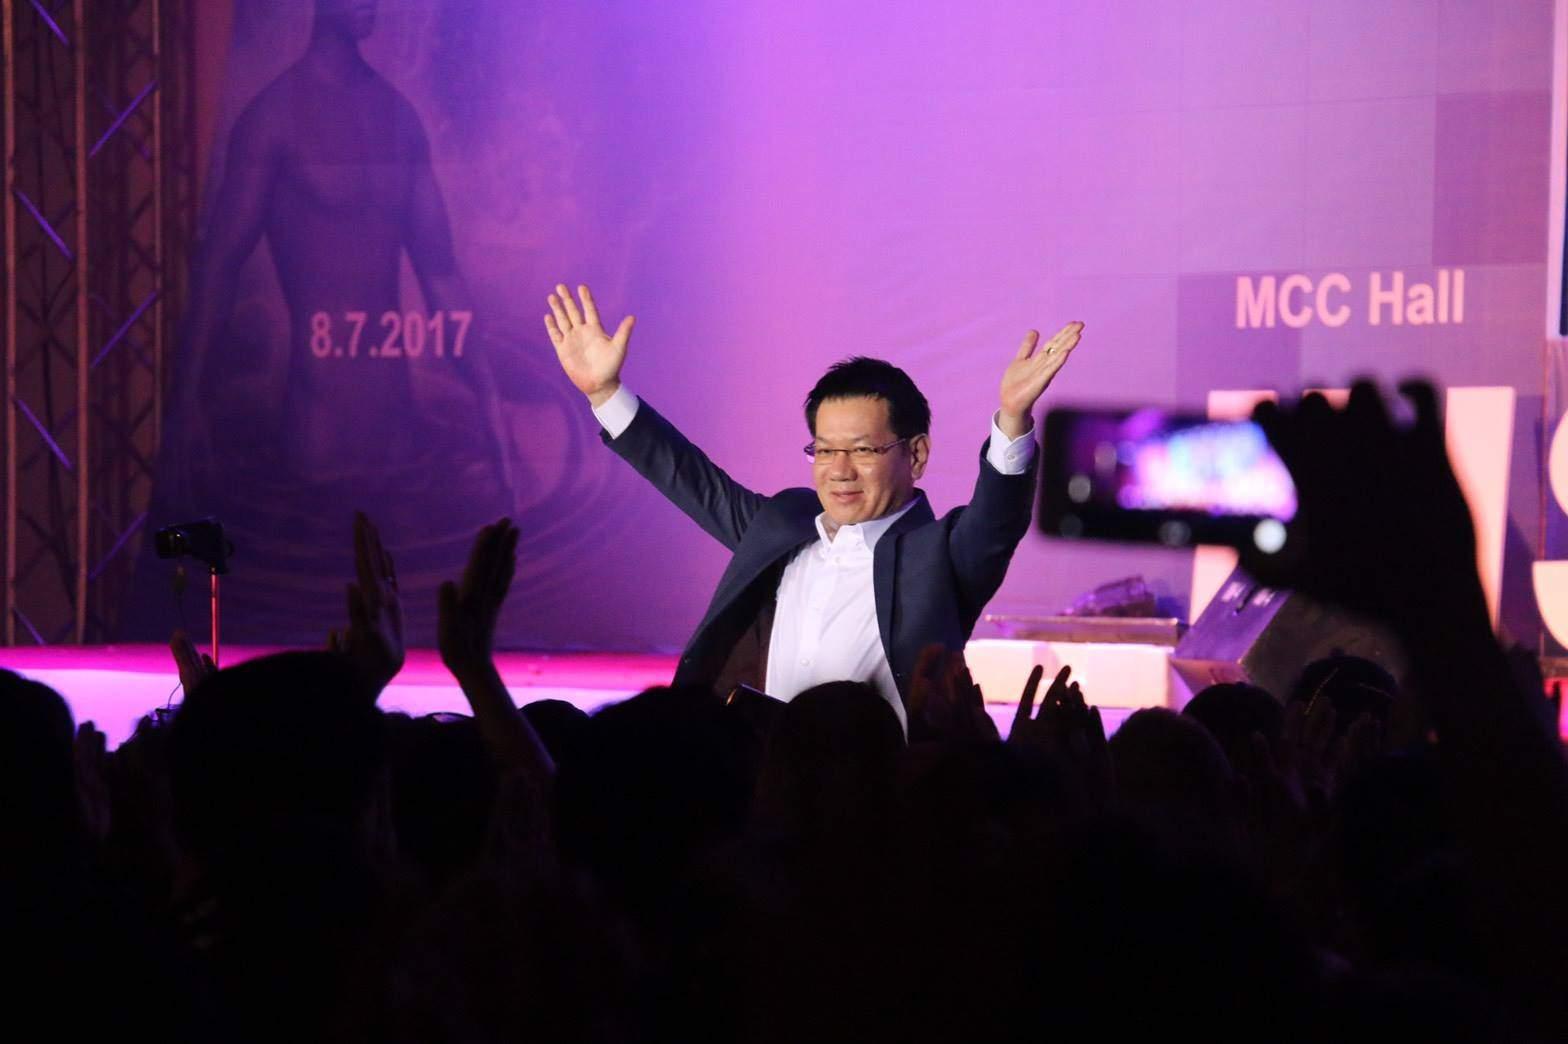 SUCCESSMORE Inspiration ครั้งที่ 17 เมืองย่างกุ้ง ประเทศเมียนมาร์ (2)